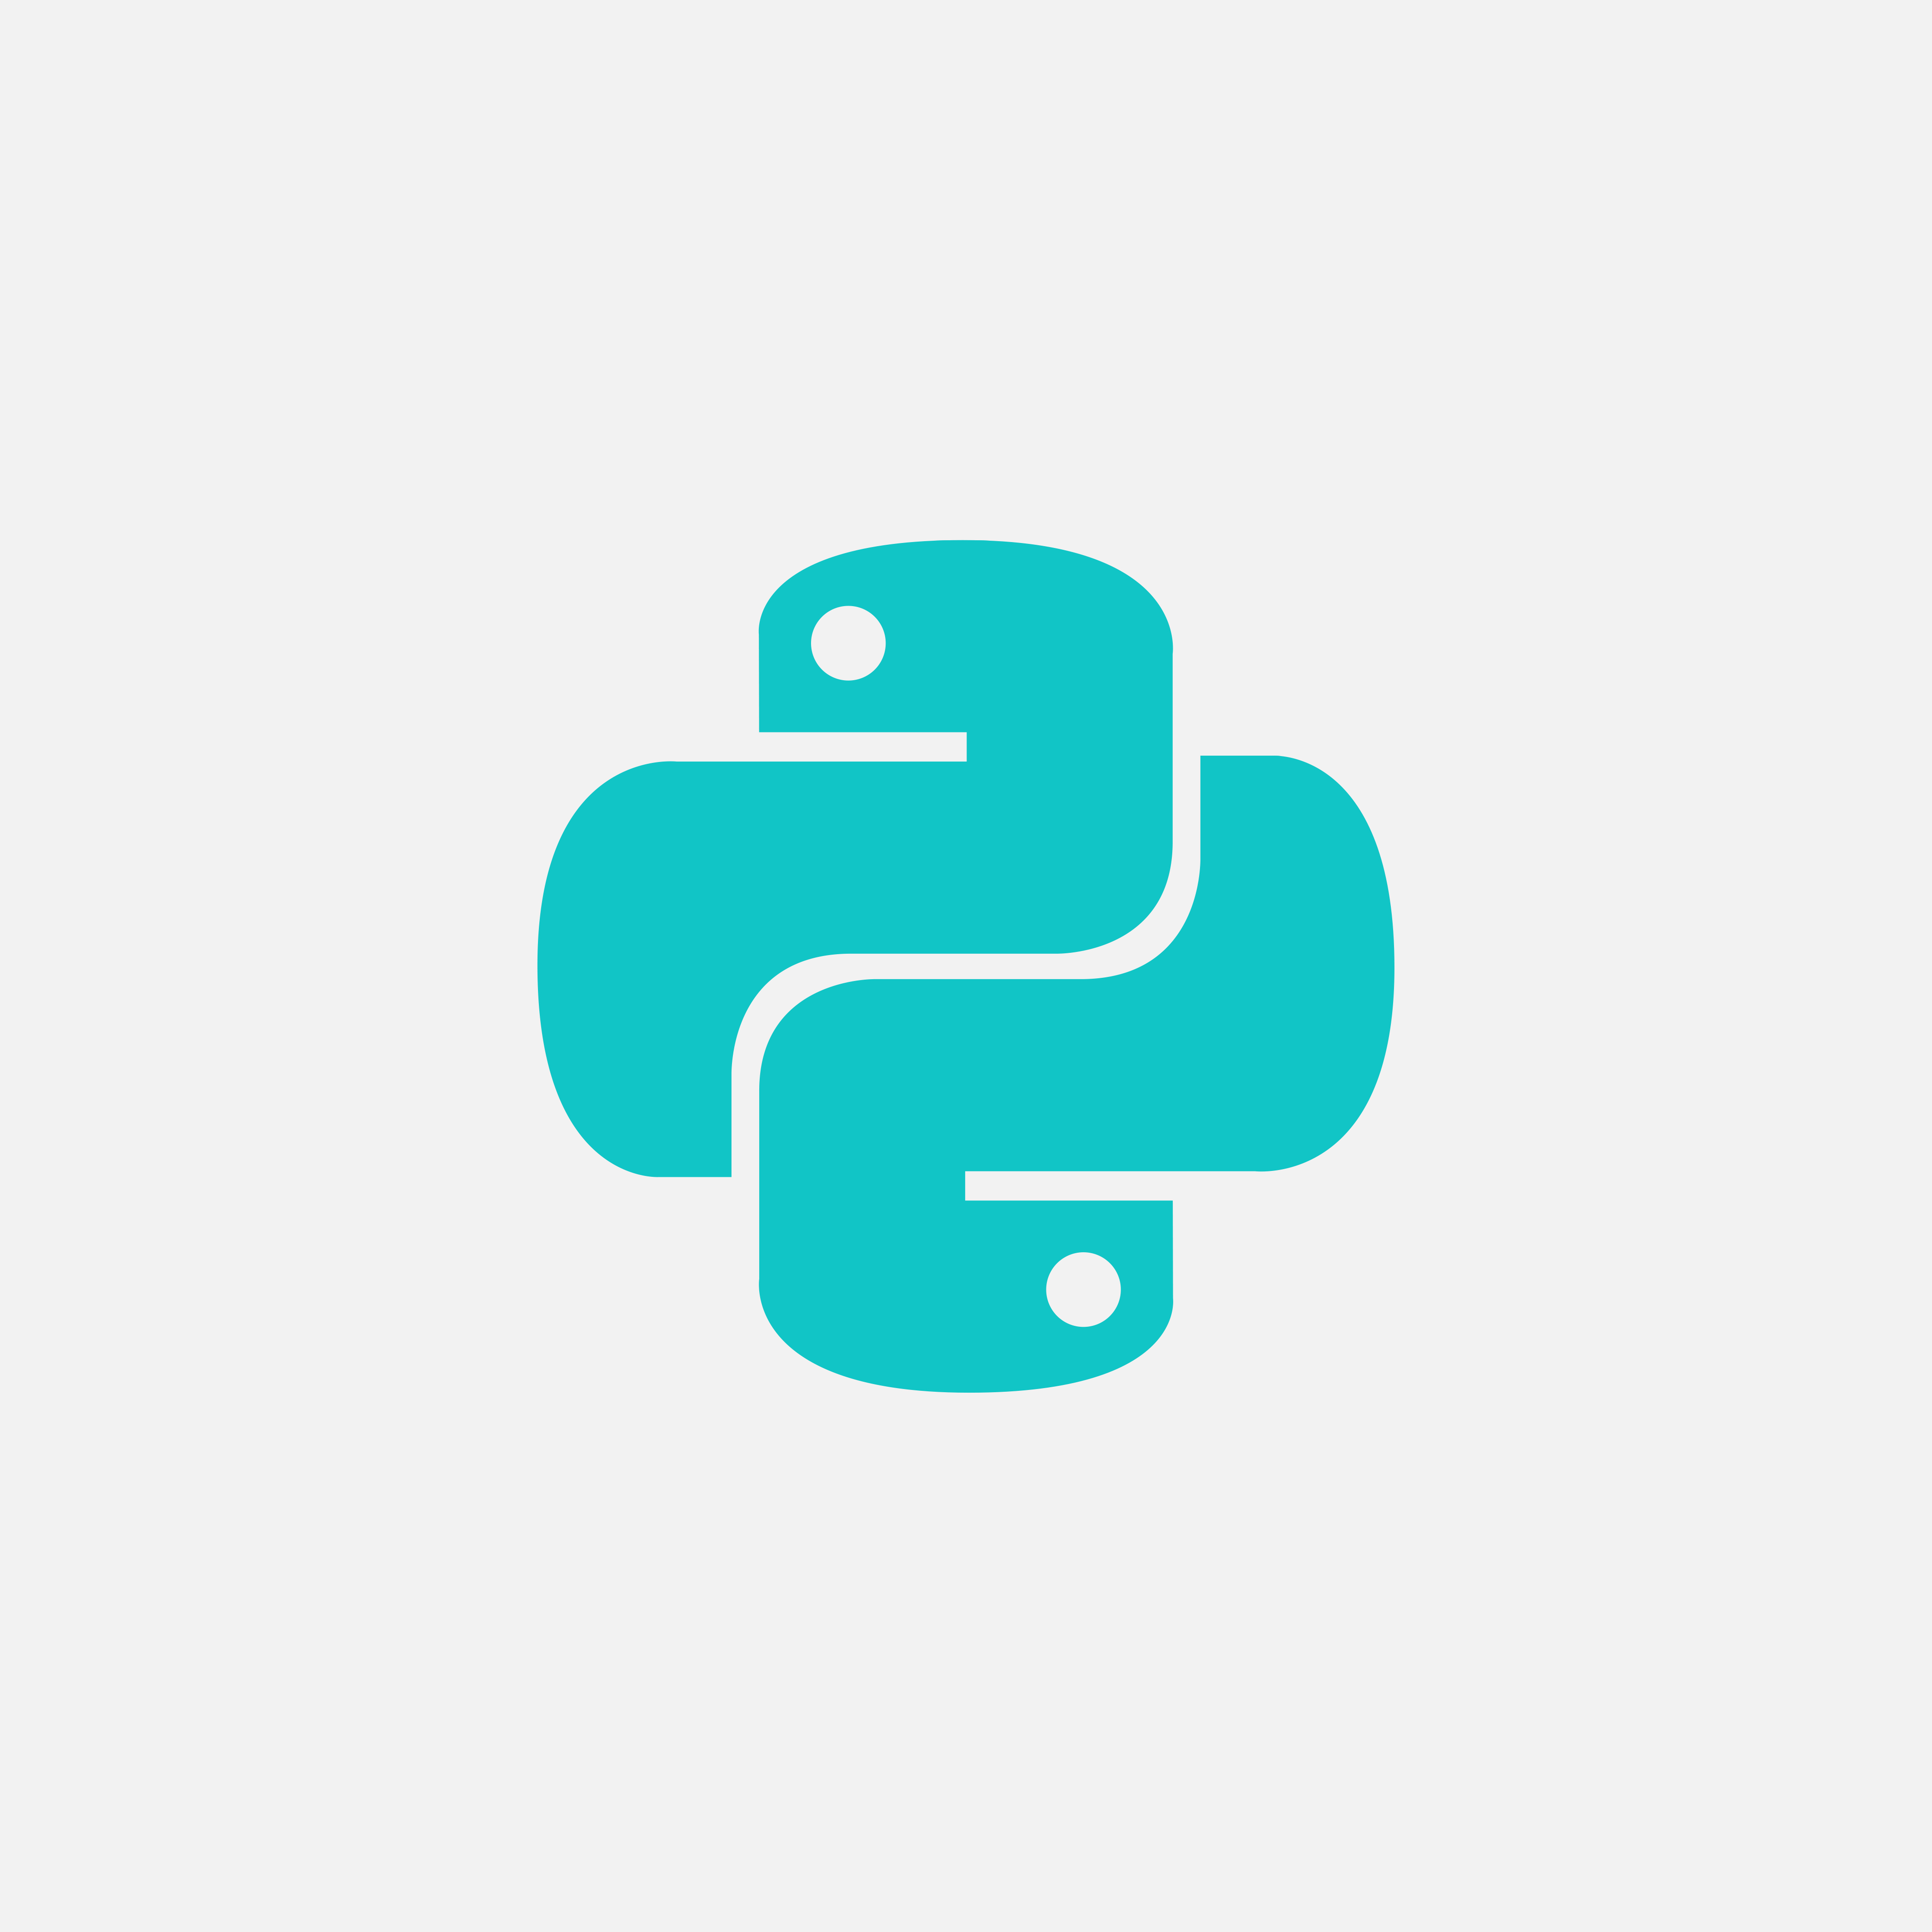 Memulai Pemrograman Dengan Python